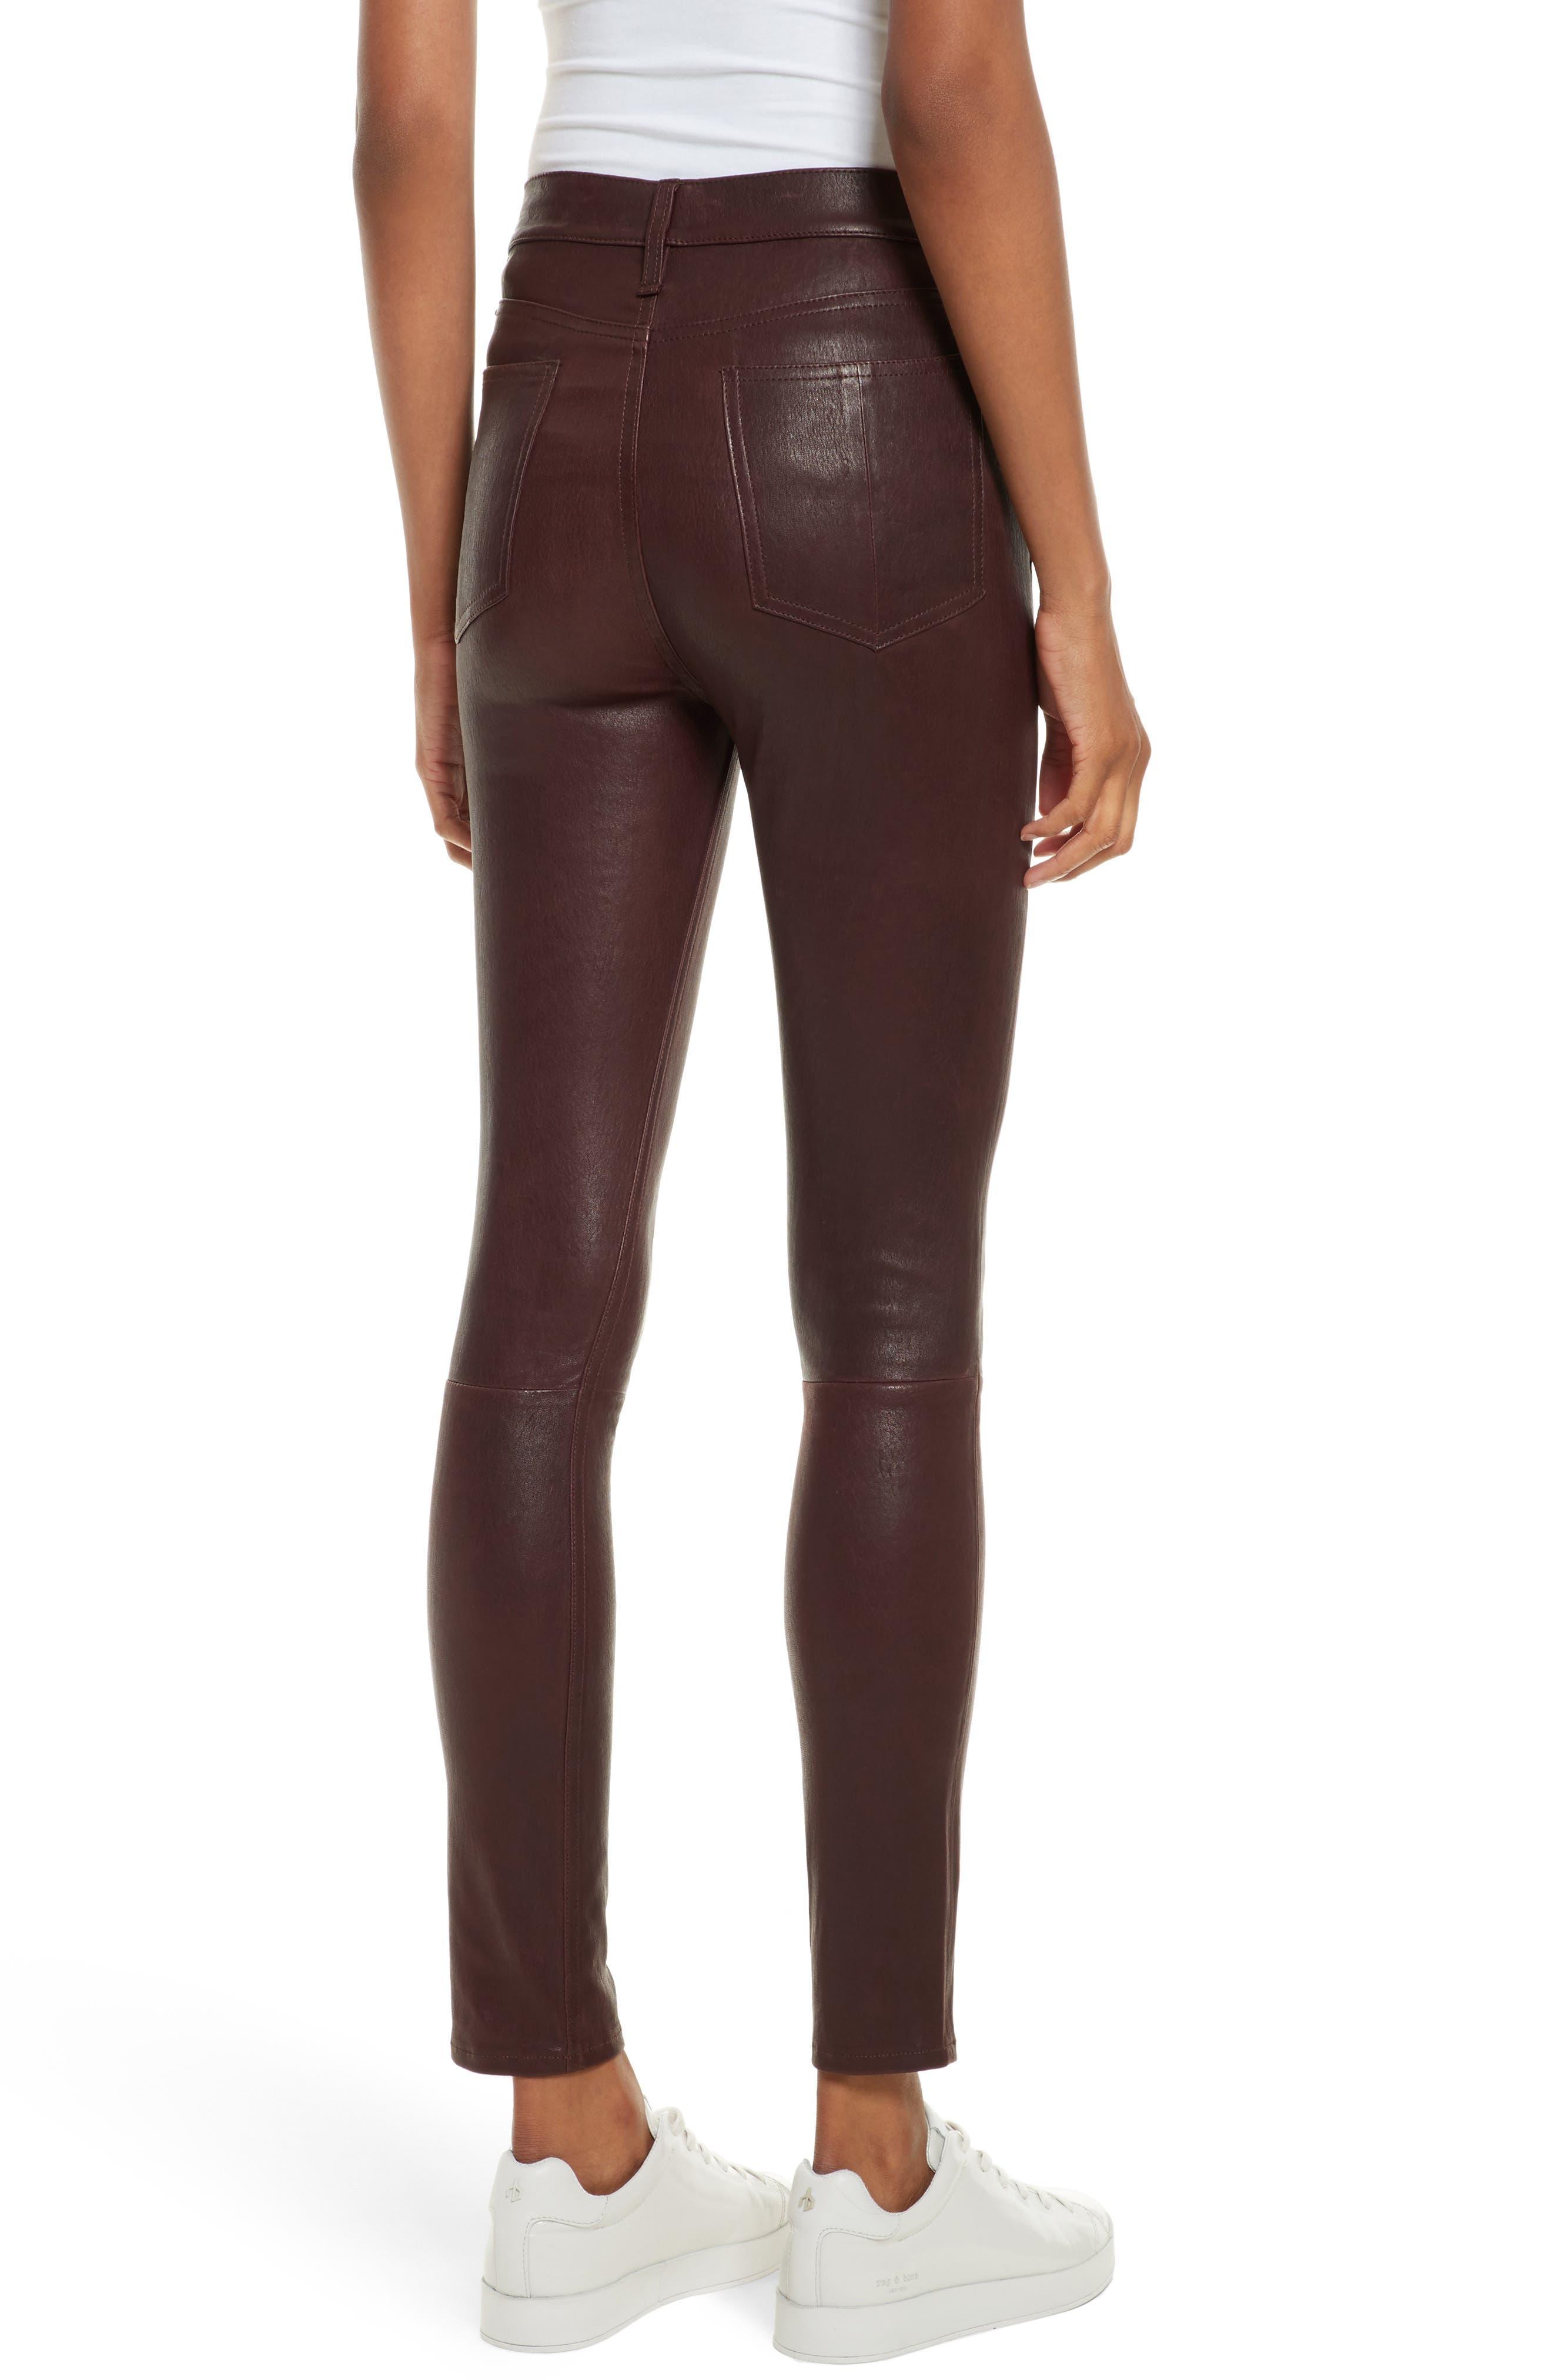 Lambskin Leather Pants,                             Alternate thumbnail 2, color,                             230